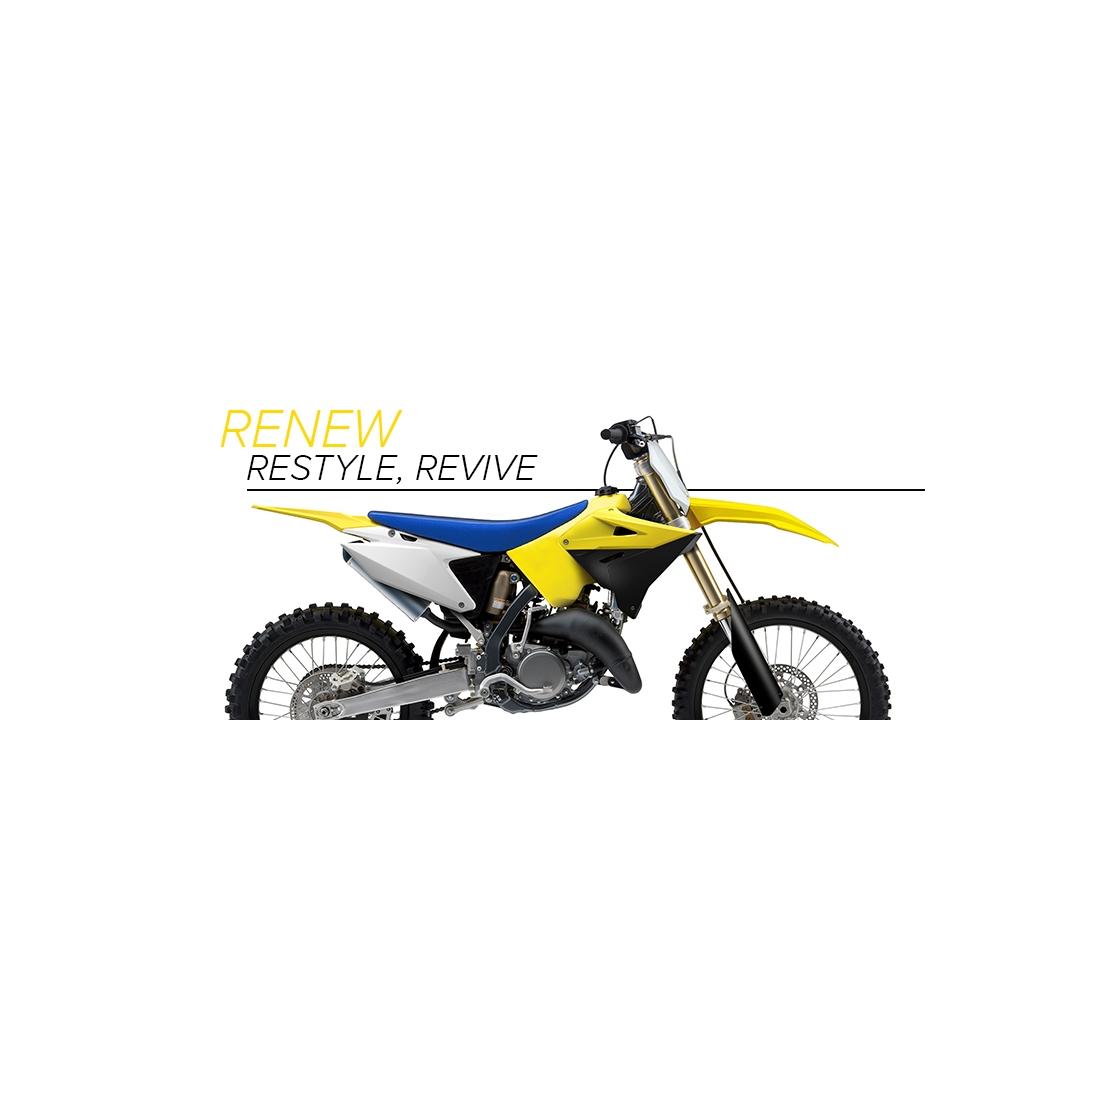 Nuovi kit Restyling 2019 per Suzuki RM 125 / 250 2T da Polisport